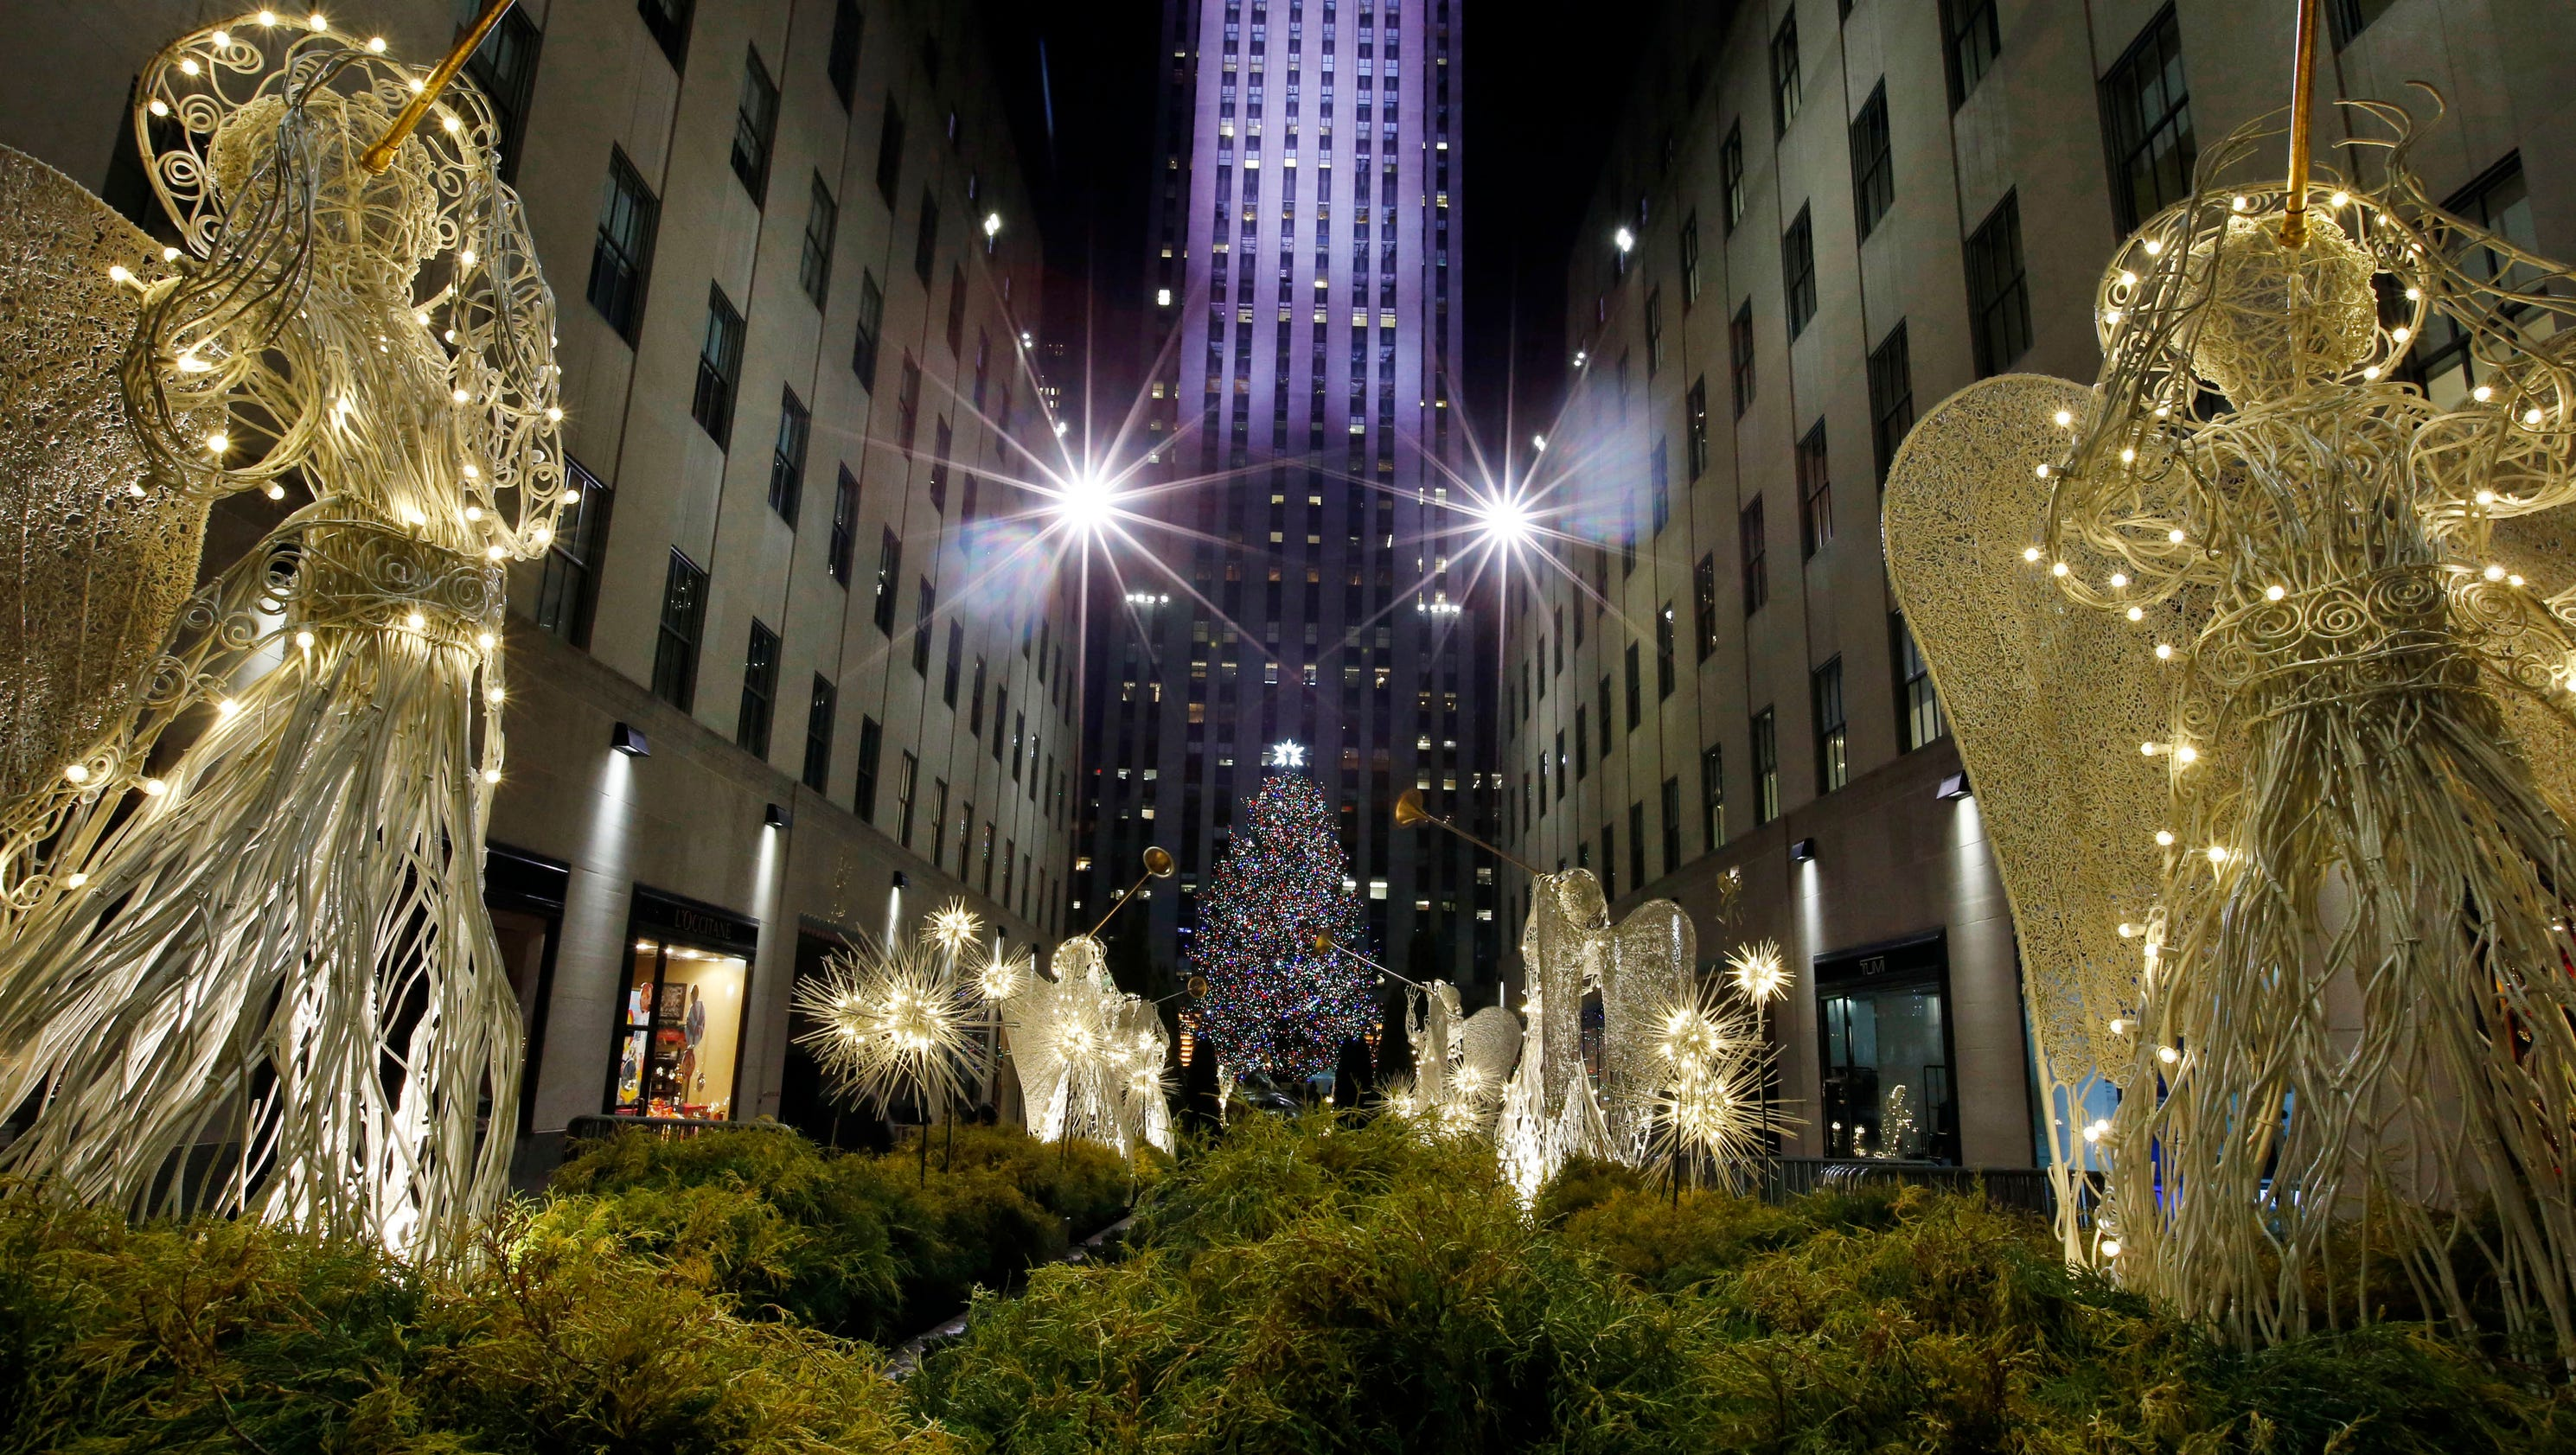 View Rockefeller Christmas Tree Lighting